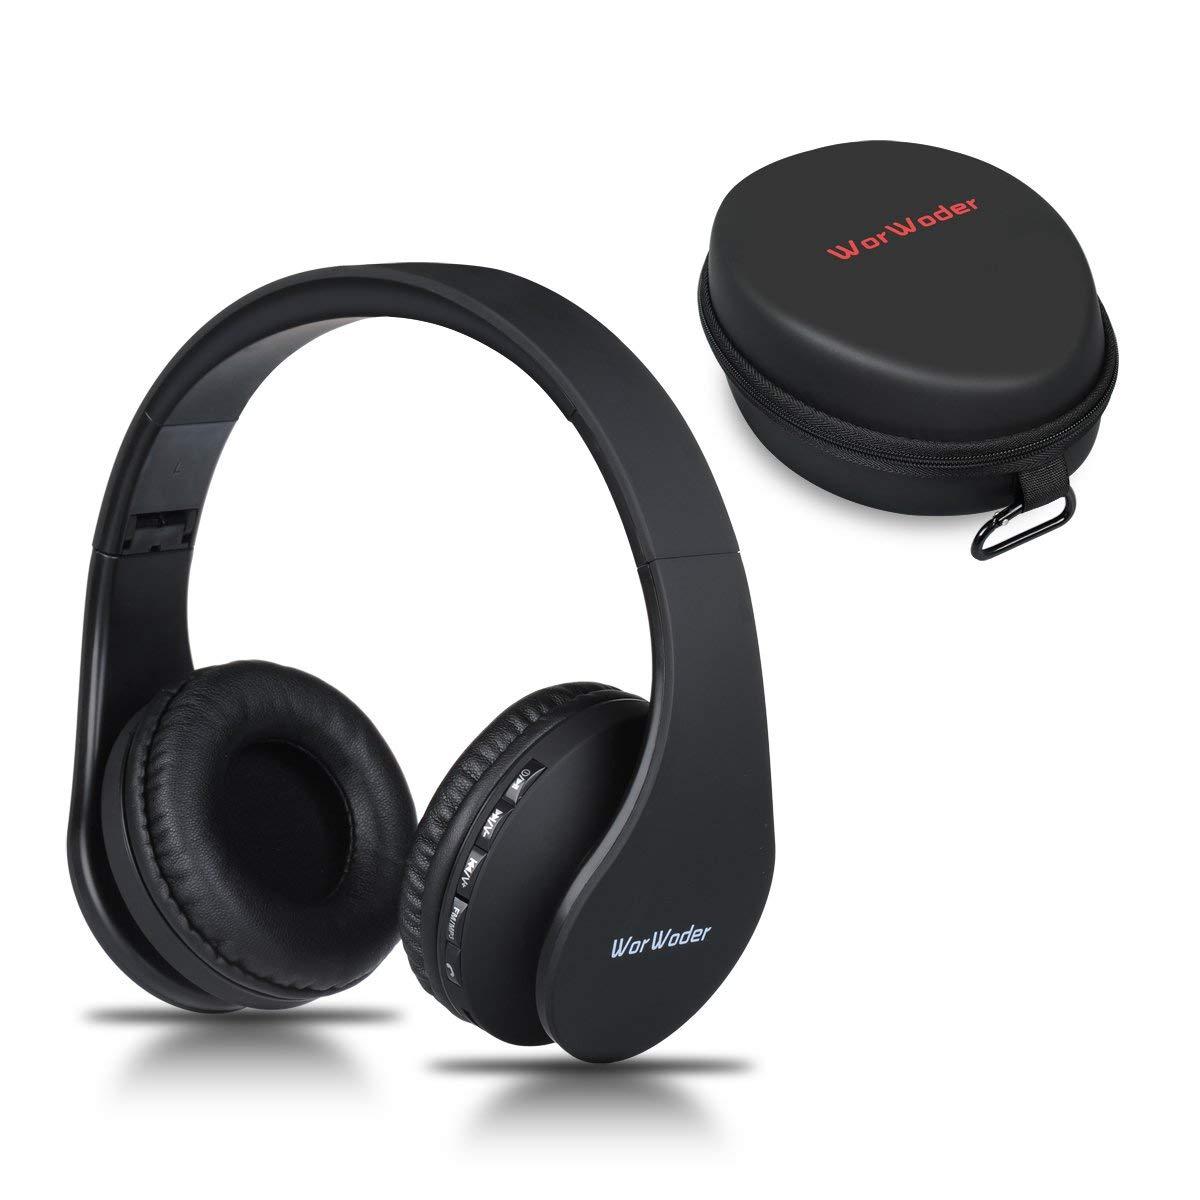 Wireless Bluetooth Over Ear Stereo Foldable Headphones